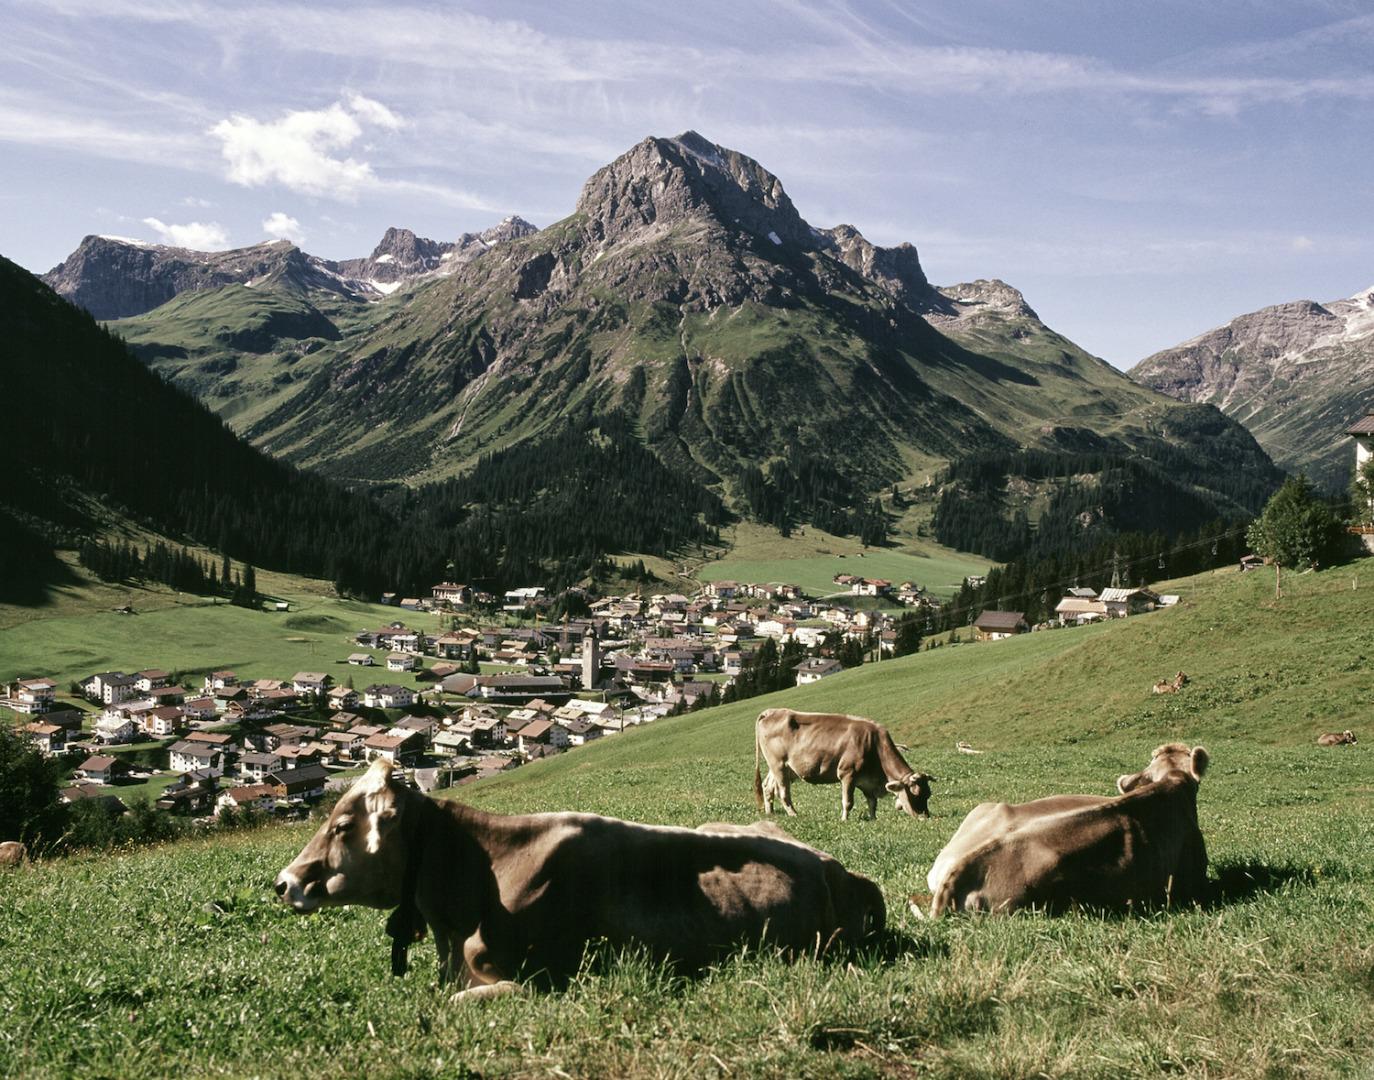 Bild zum Wellness-Angebot Faszination Berge -Bergsportwoche